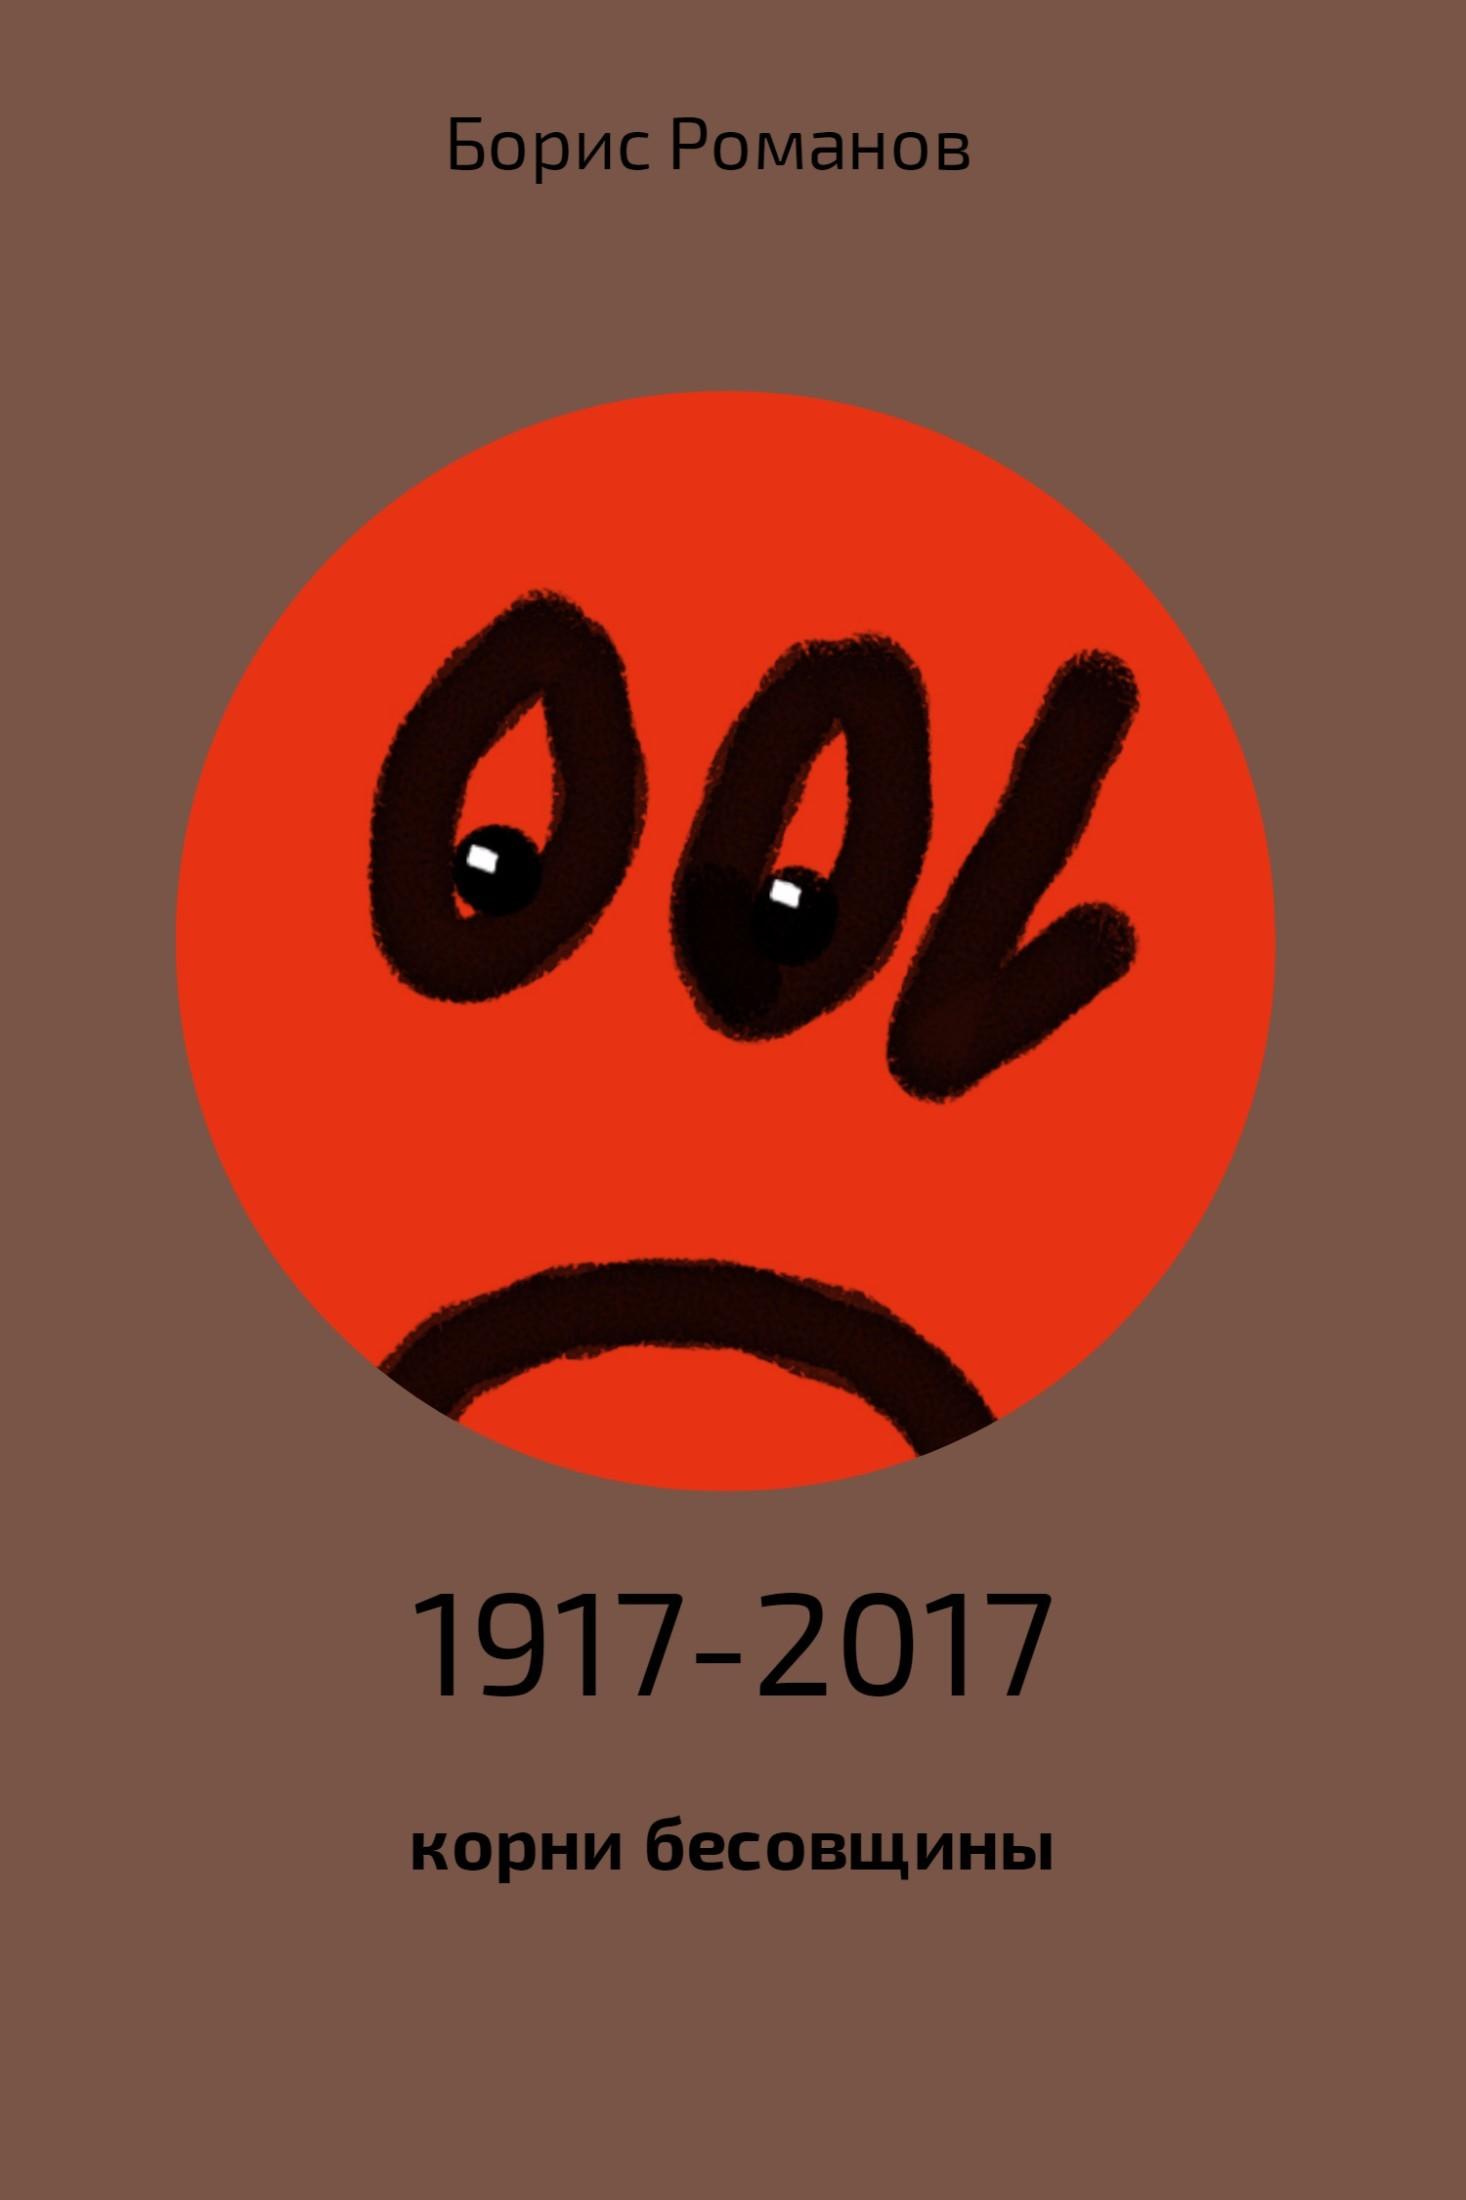 1917-2017: